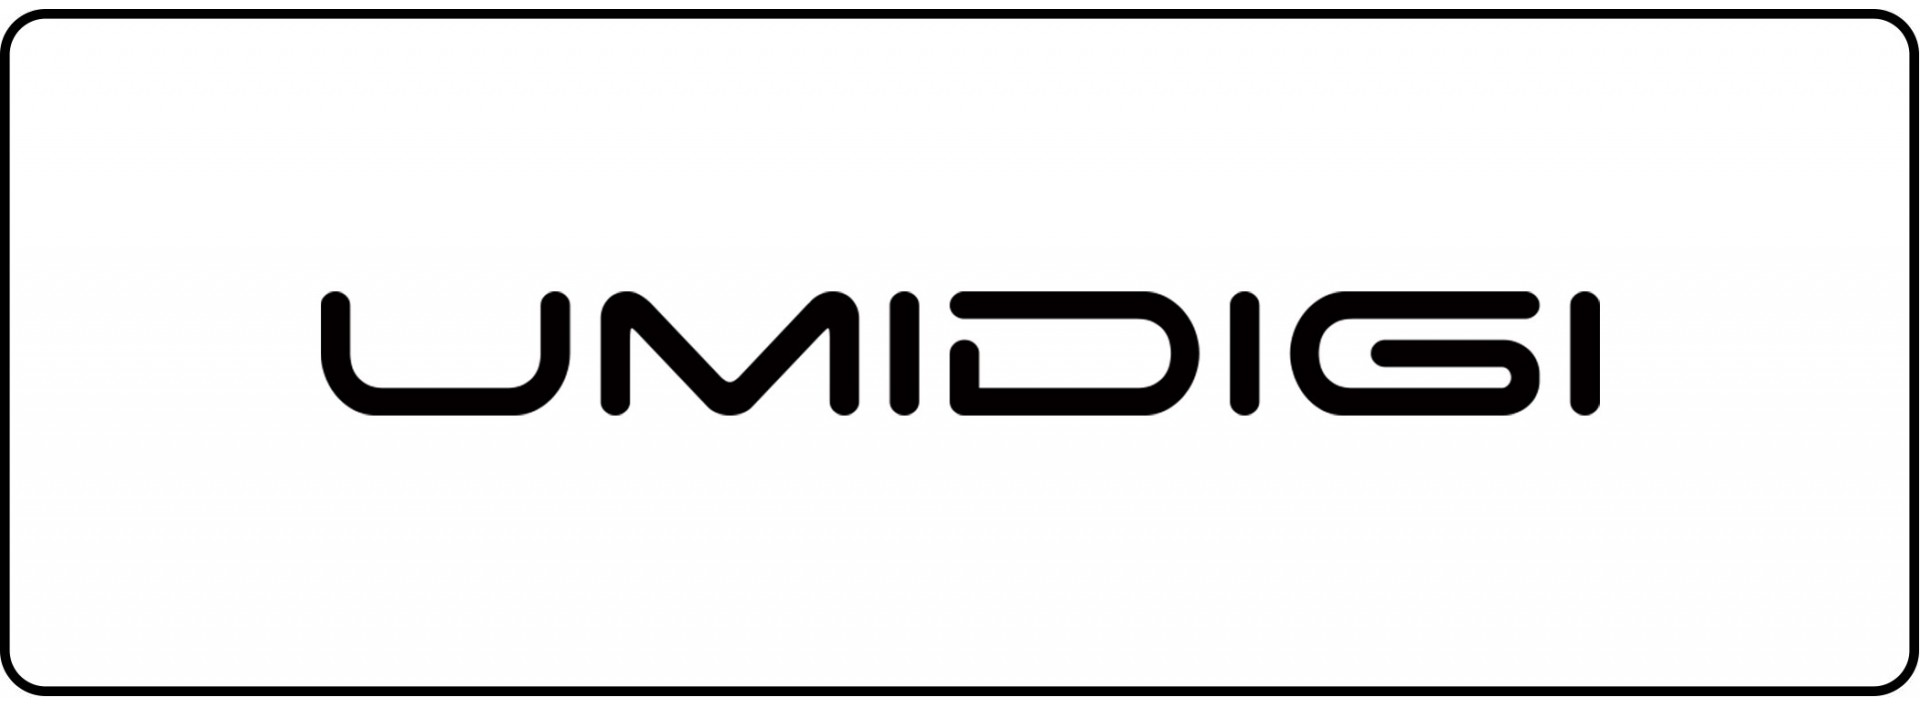 Fundas para Umidigi | TuMundoSmartphone | Envio Gratis